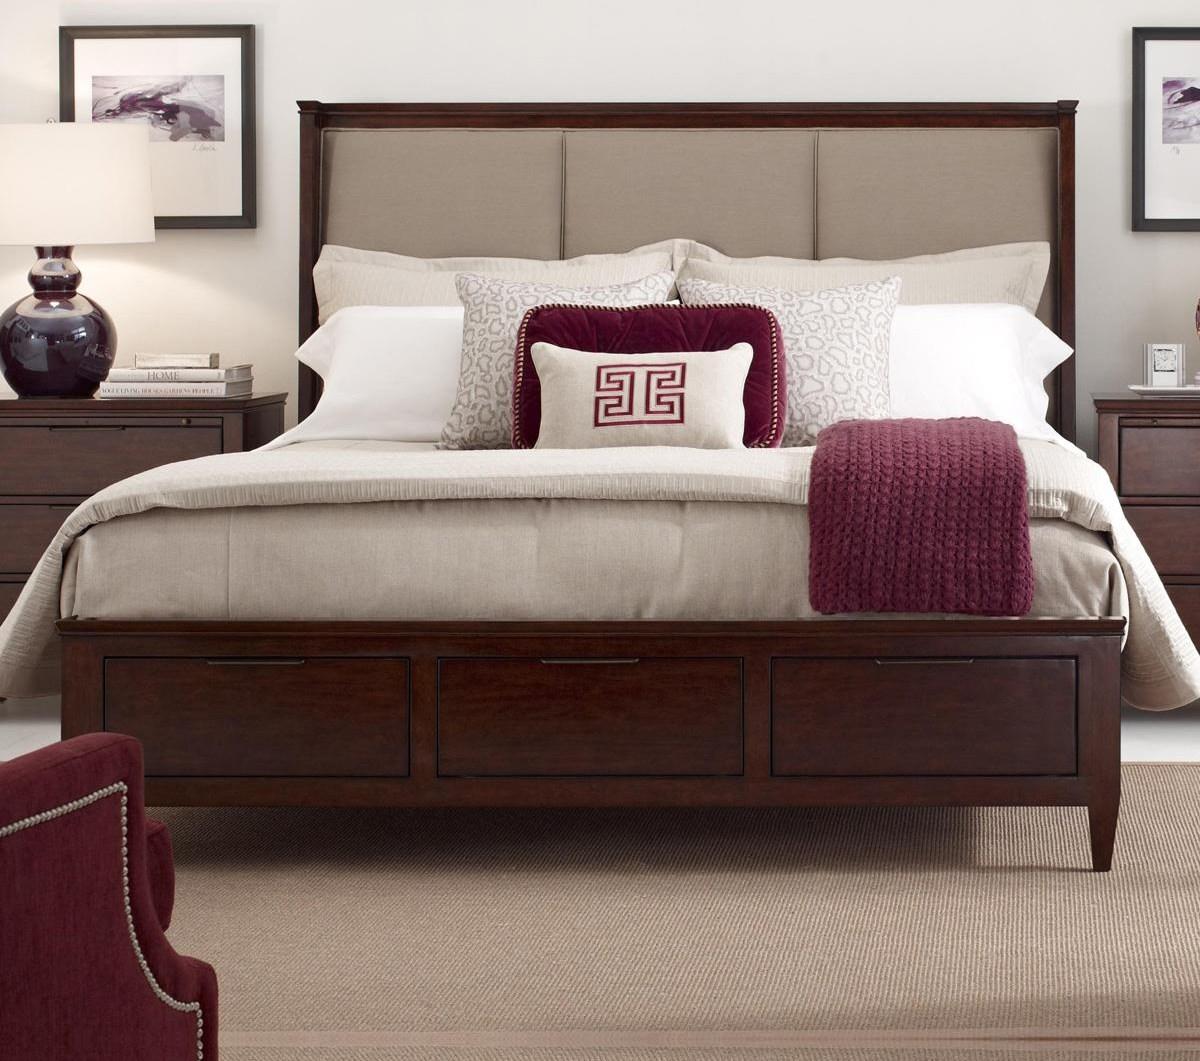 Kincaid Furniture Elise Spectrum King Upholstered Bed With Storage Footboard Belfort Furniture